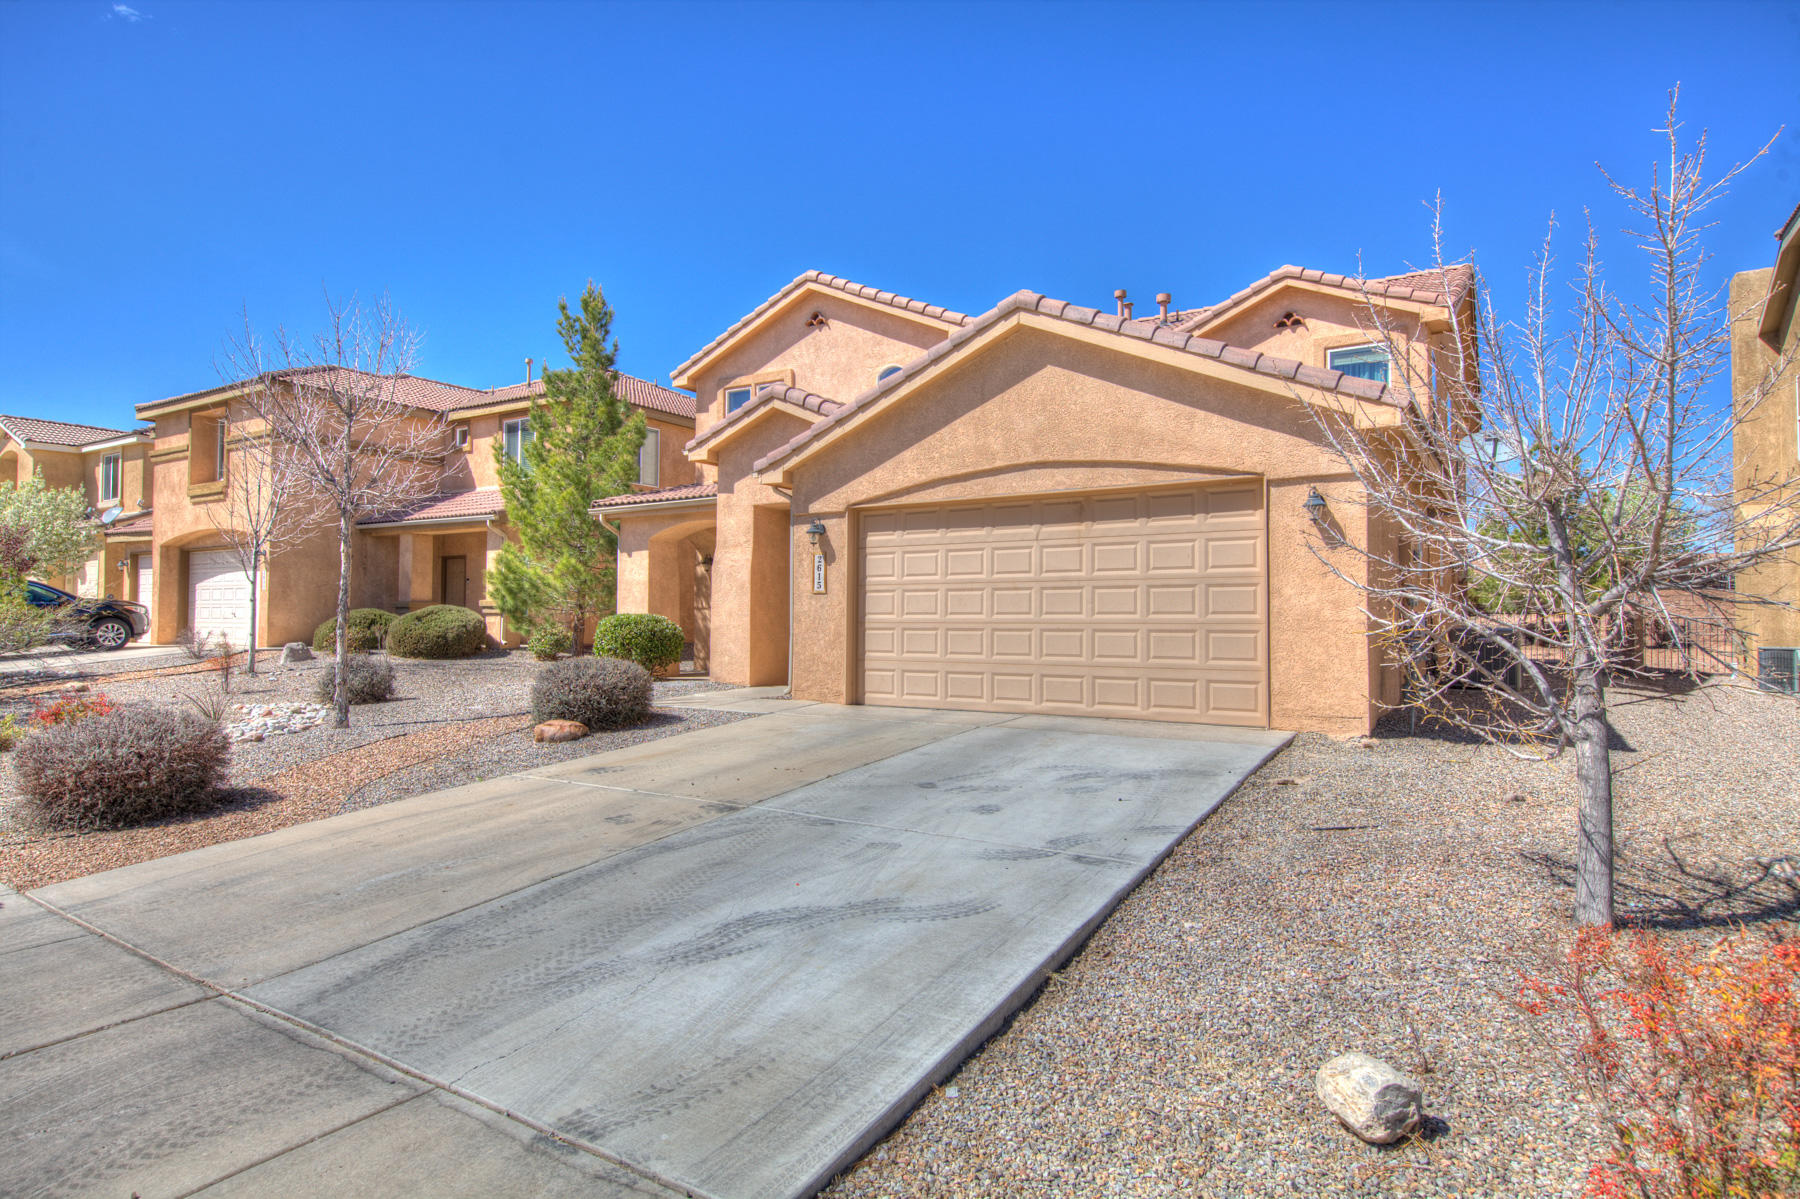 2615 SE Camino Seville, Rio Rancho in Sandoval County, NM 87124 Home for Sale